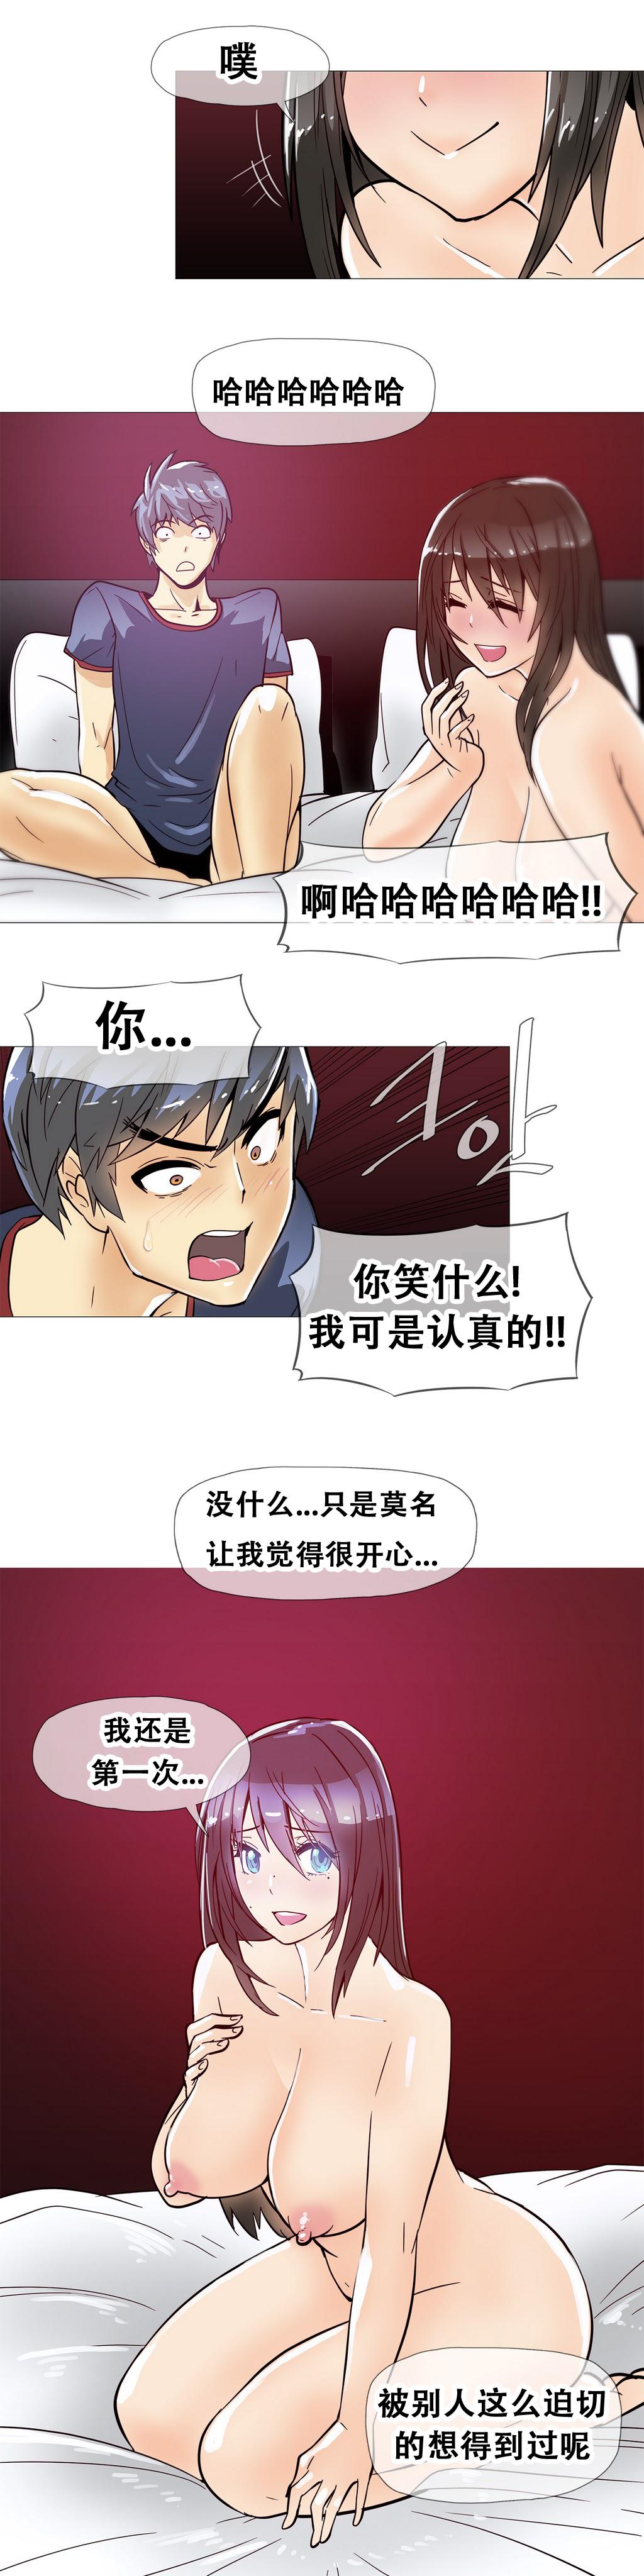 HouseHold Affairs 【卞赤鲤个人汉化】1~21话(持续更新中) 256